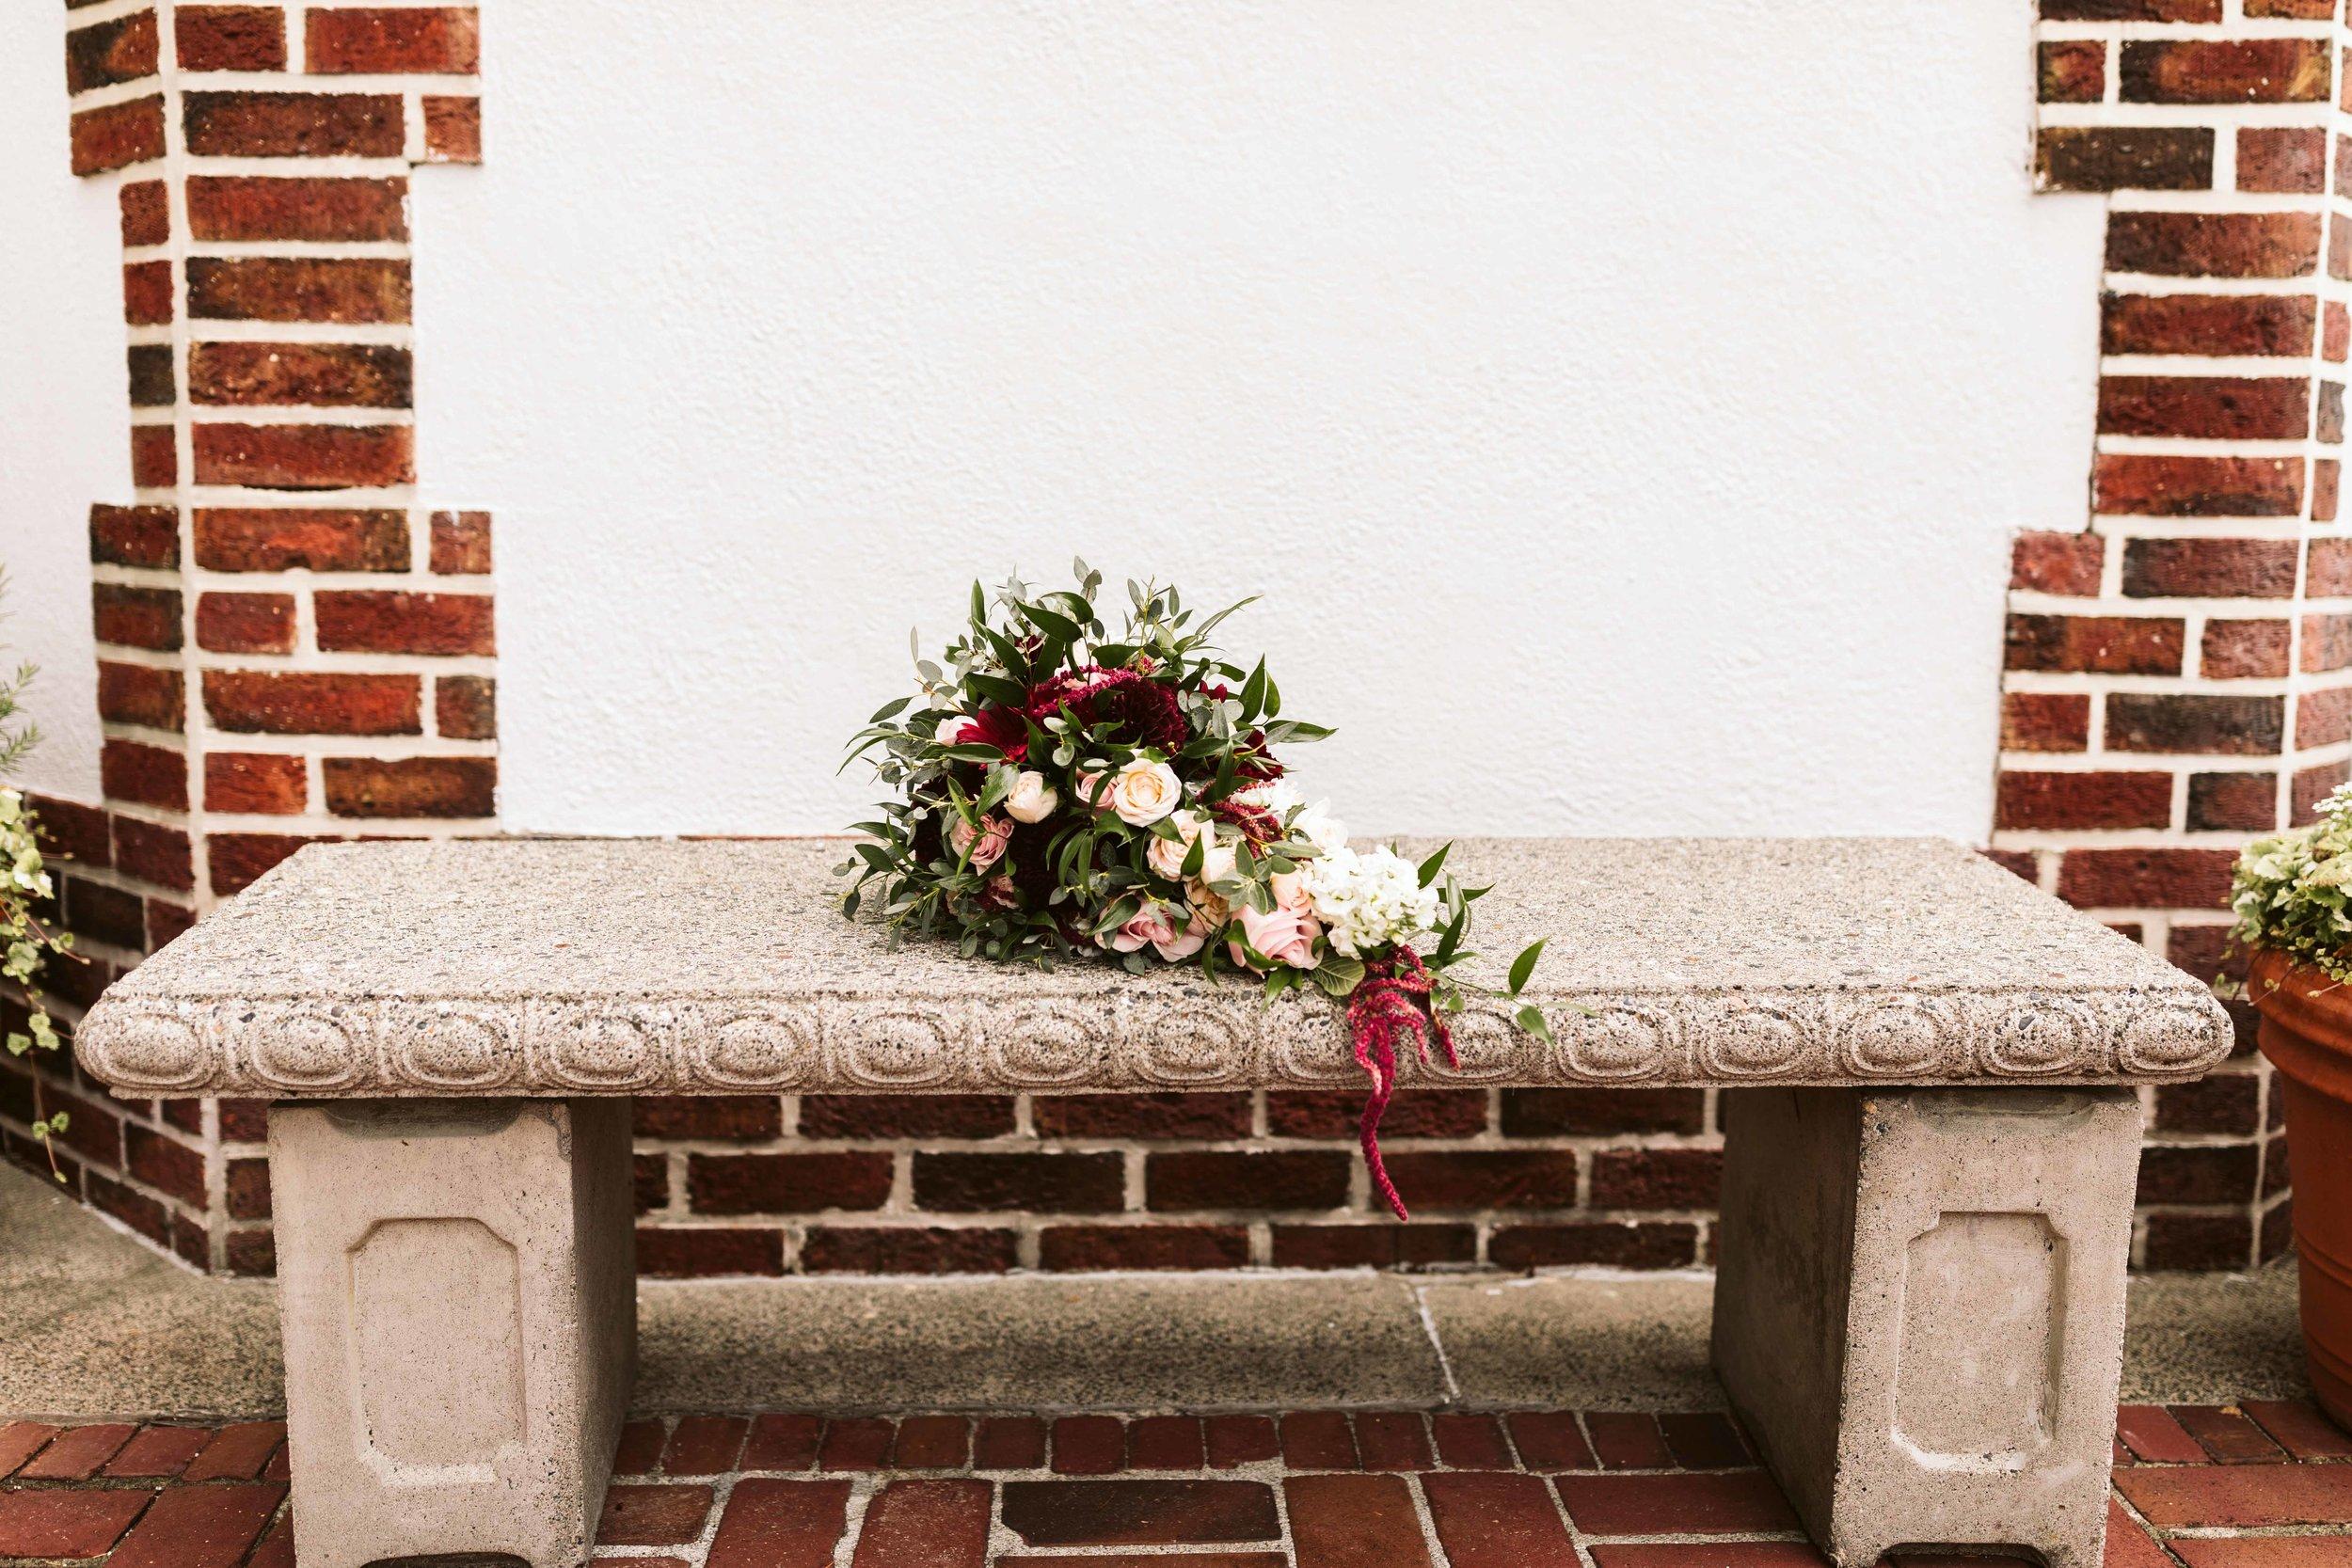 lairmont-manor-wedding-4.jpg